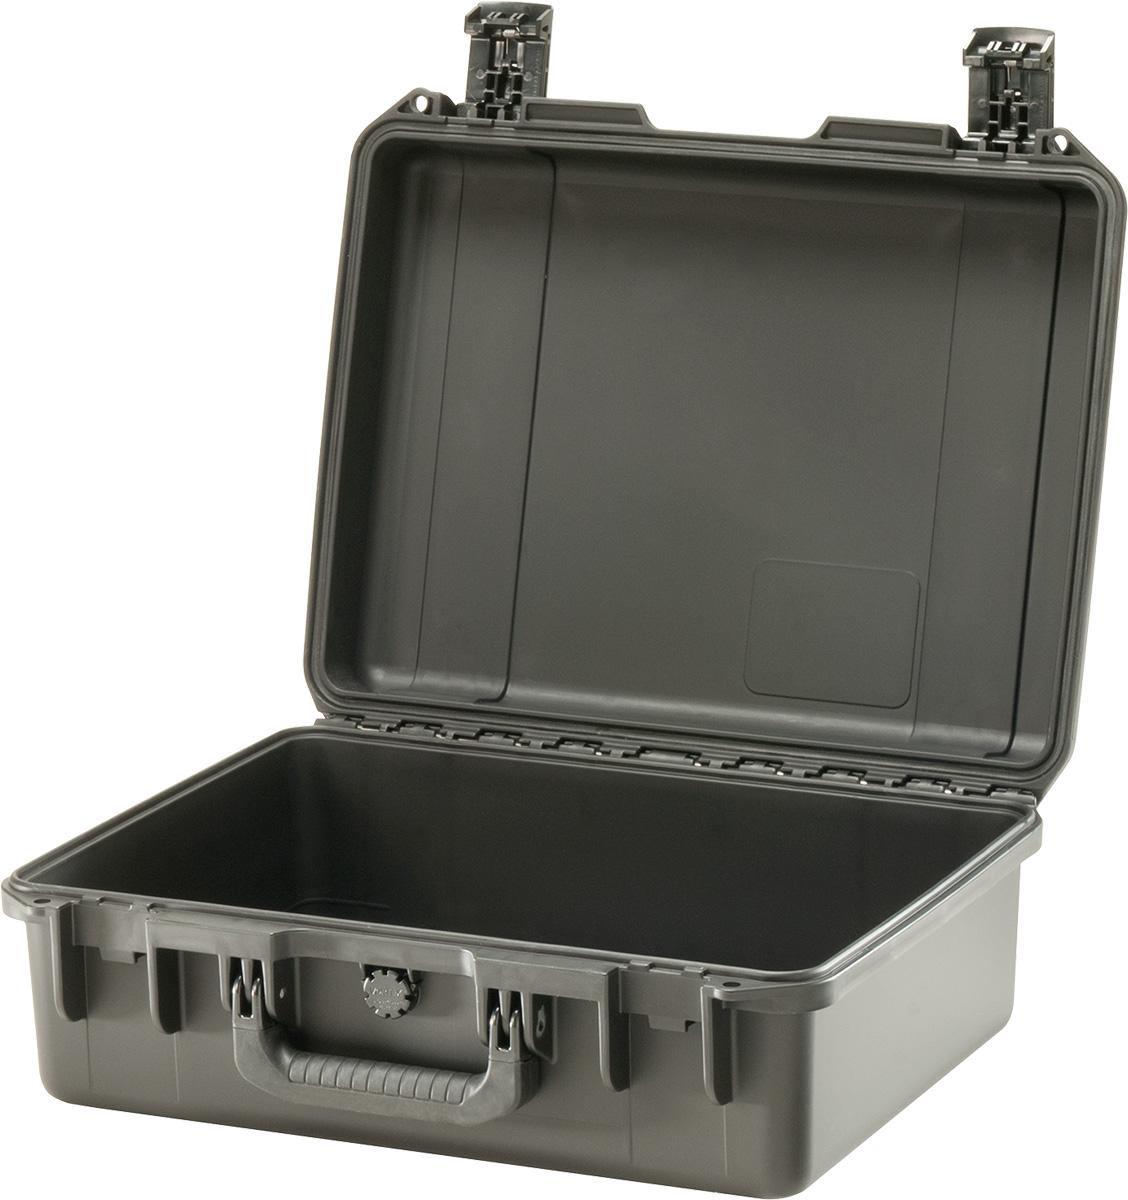 pelican im2400 pelican im2400 waterproof usa made case